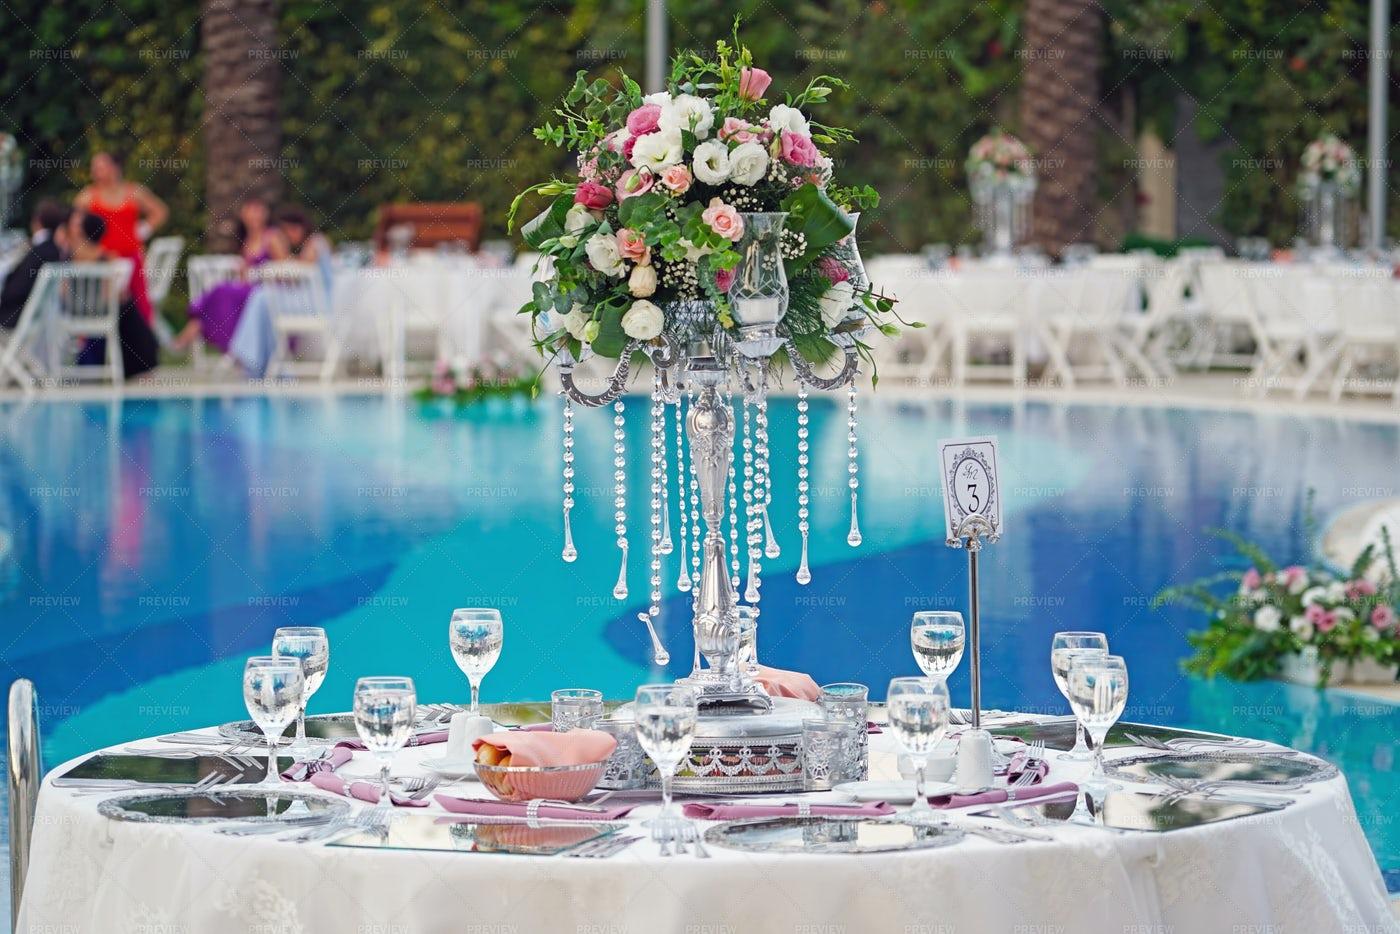 Luxury Wedding Table: Stock Photos